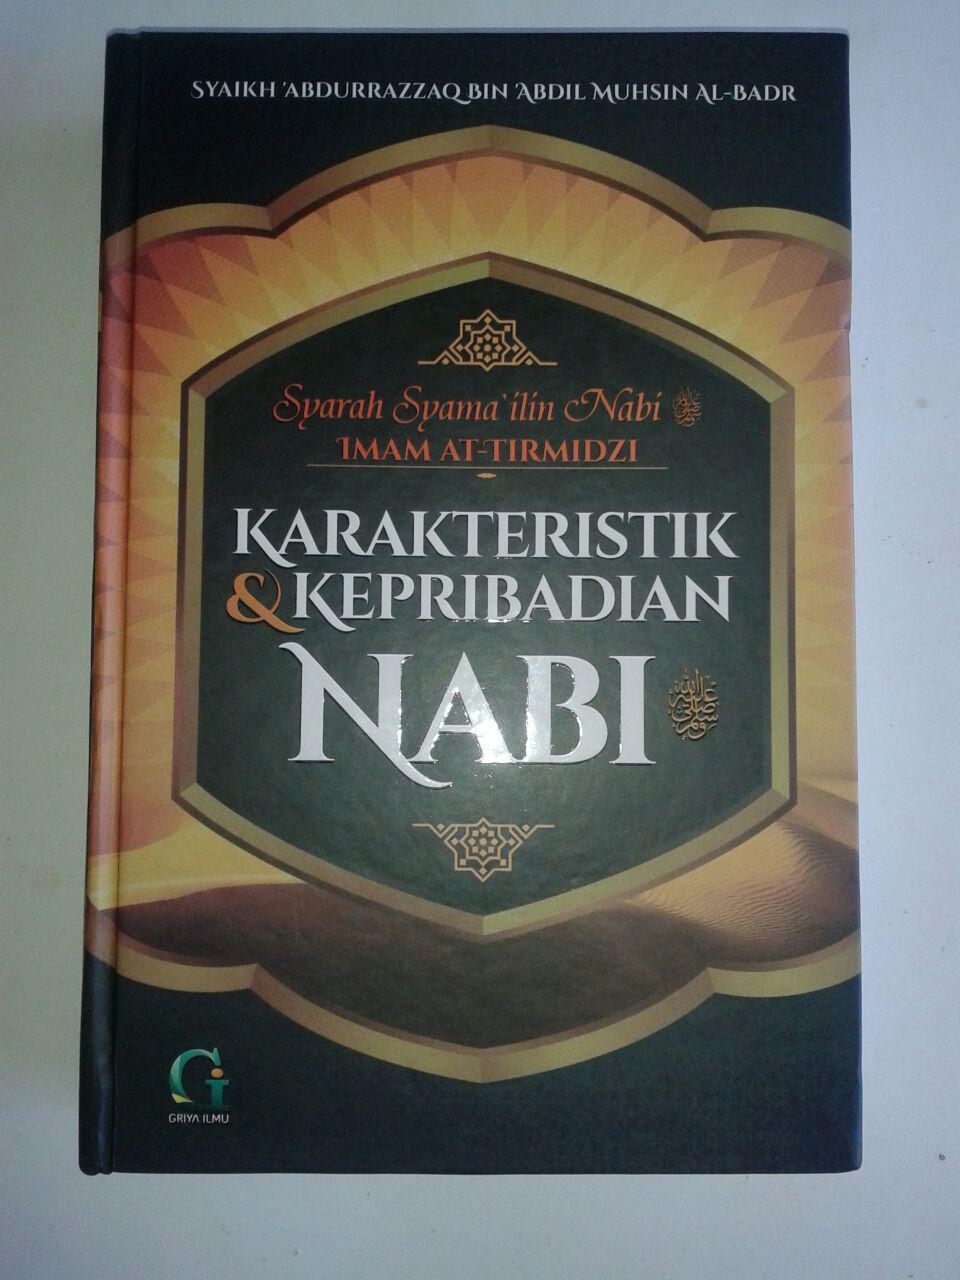 Buku Karakteristik Dan Kepribadian Nabi Syarah Syamailin Nabi cover 3